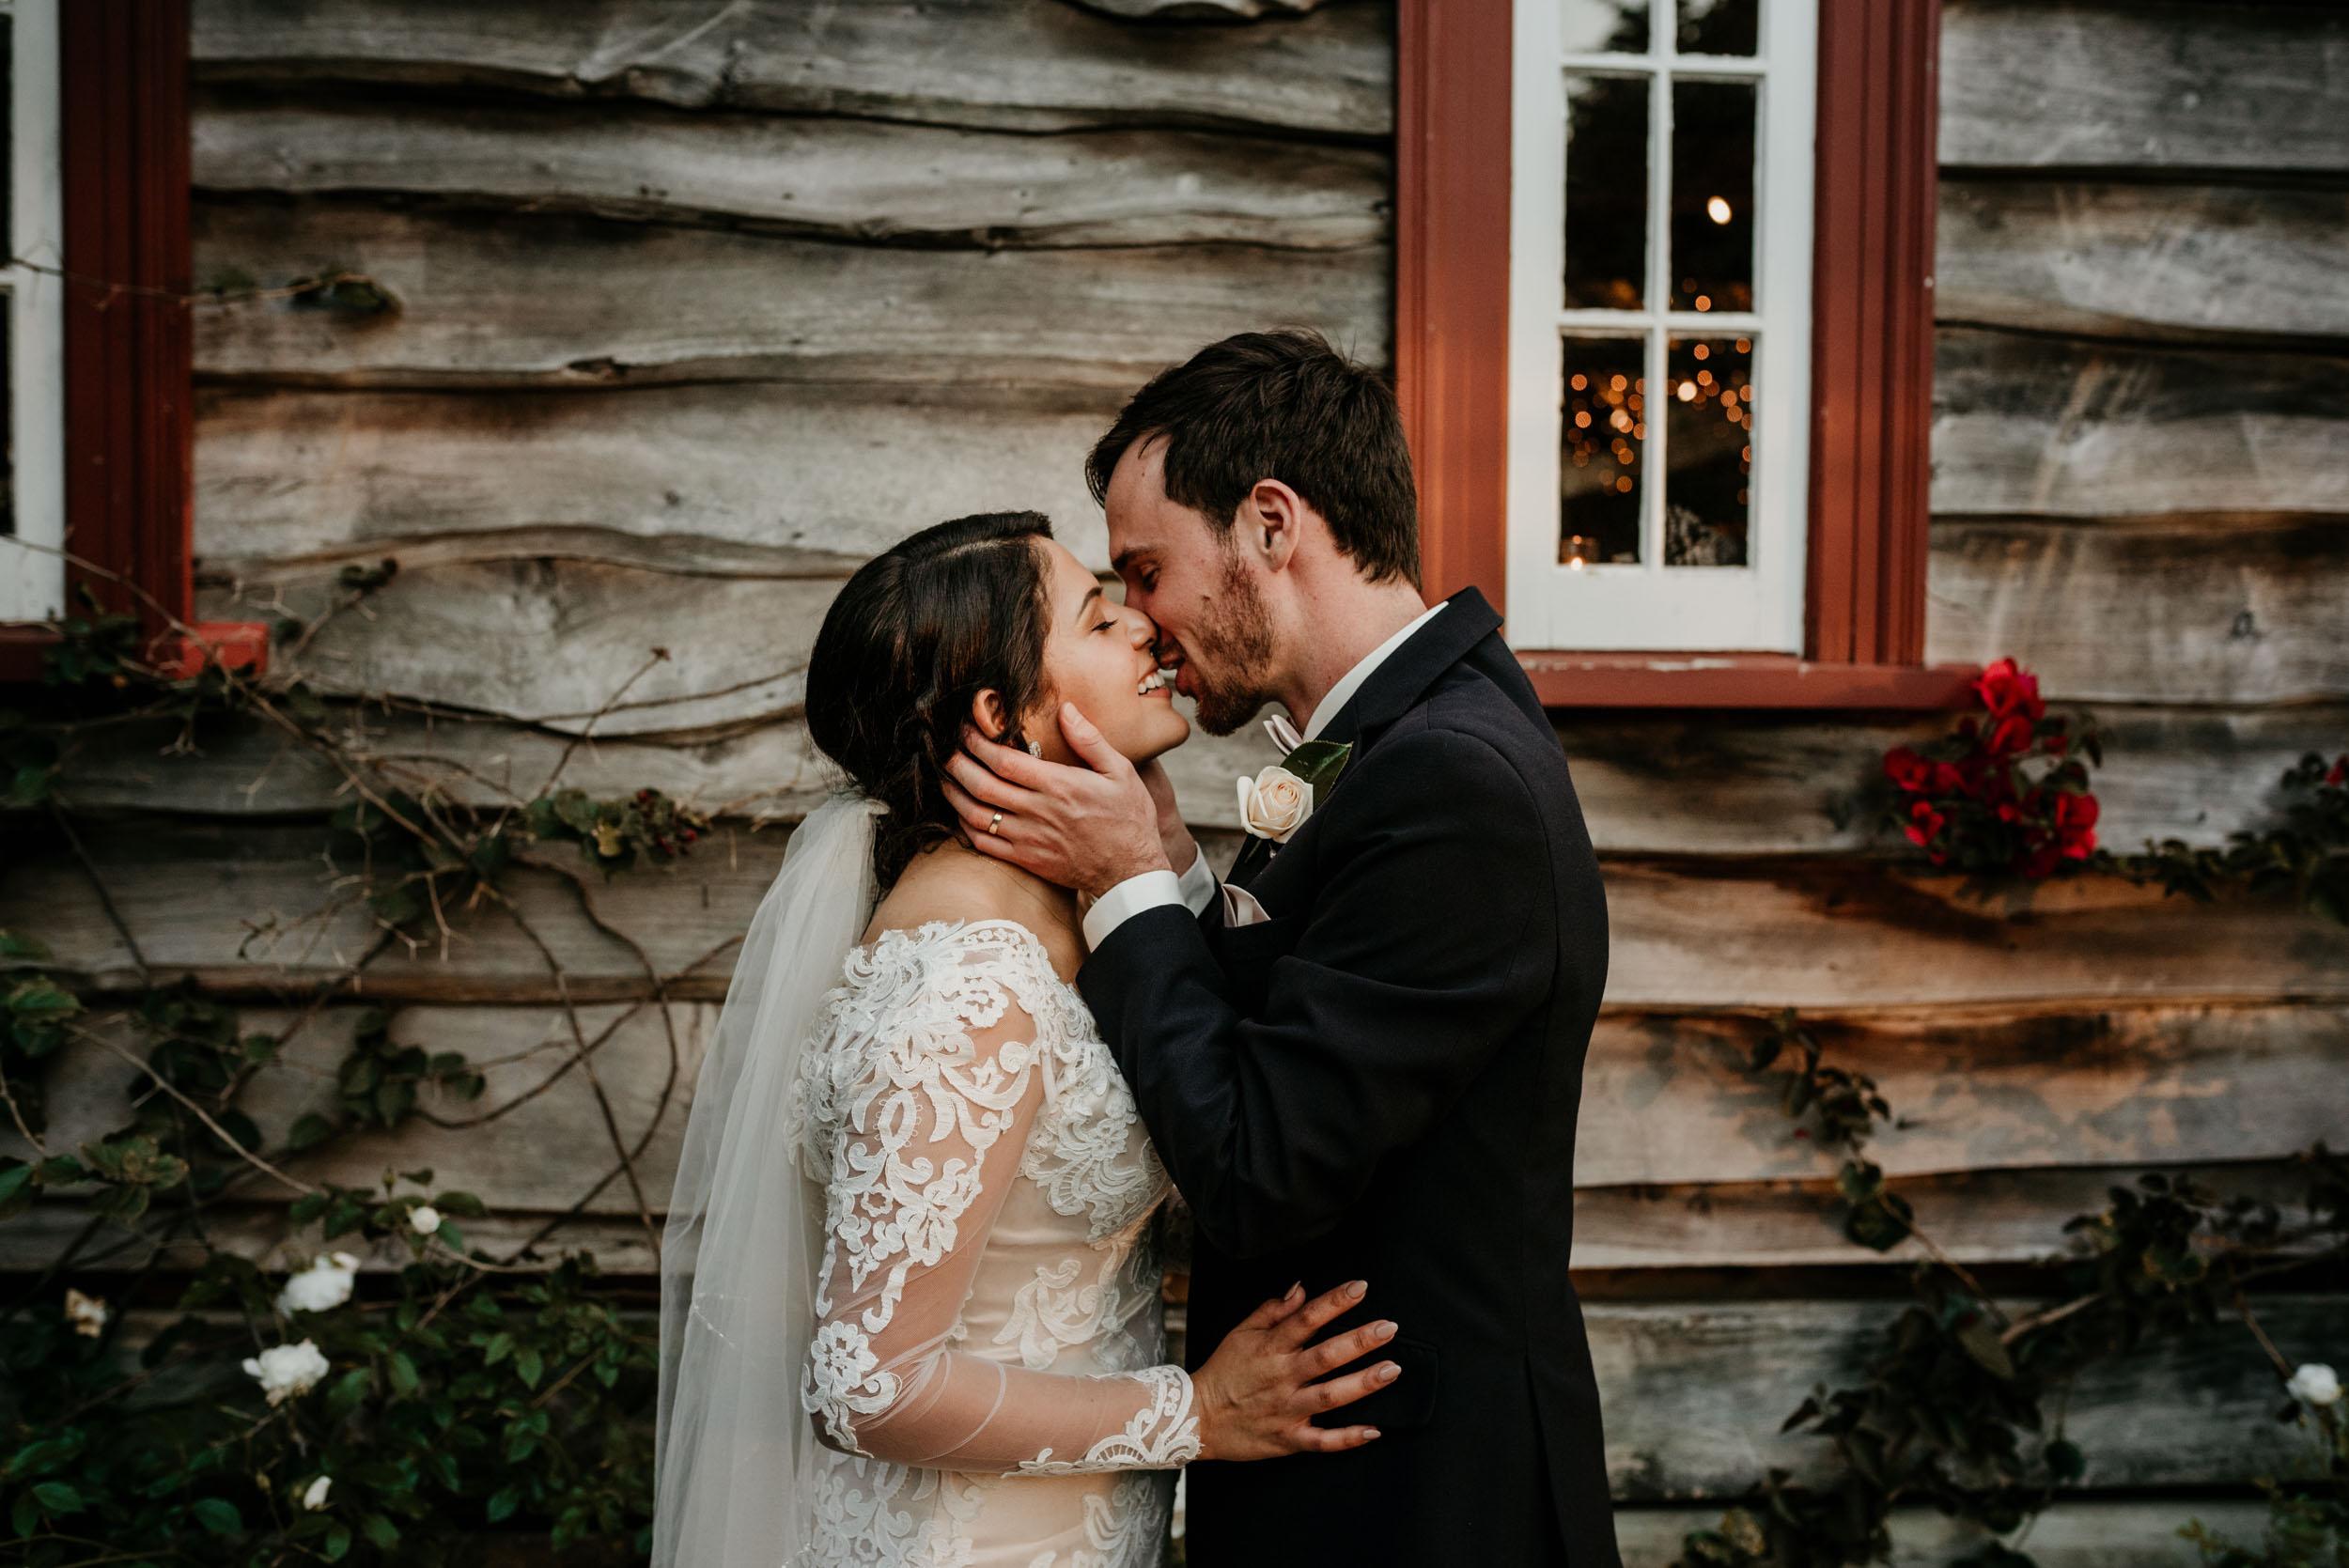 The Raw Photographer - Cairns Wedding Photographer - New Zealand Destination Photography - Travel - Australian-18.jpg